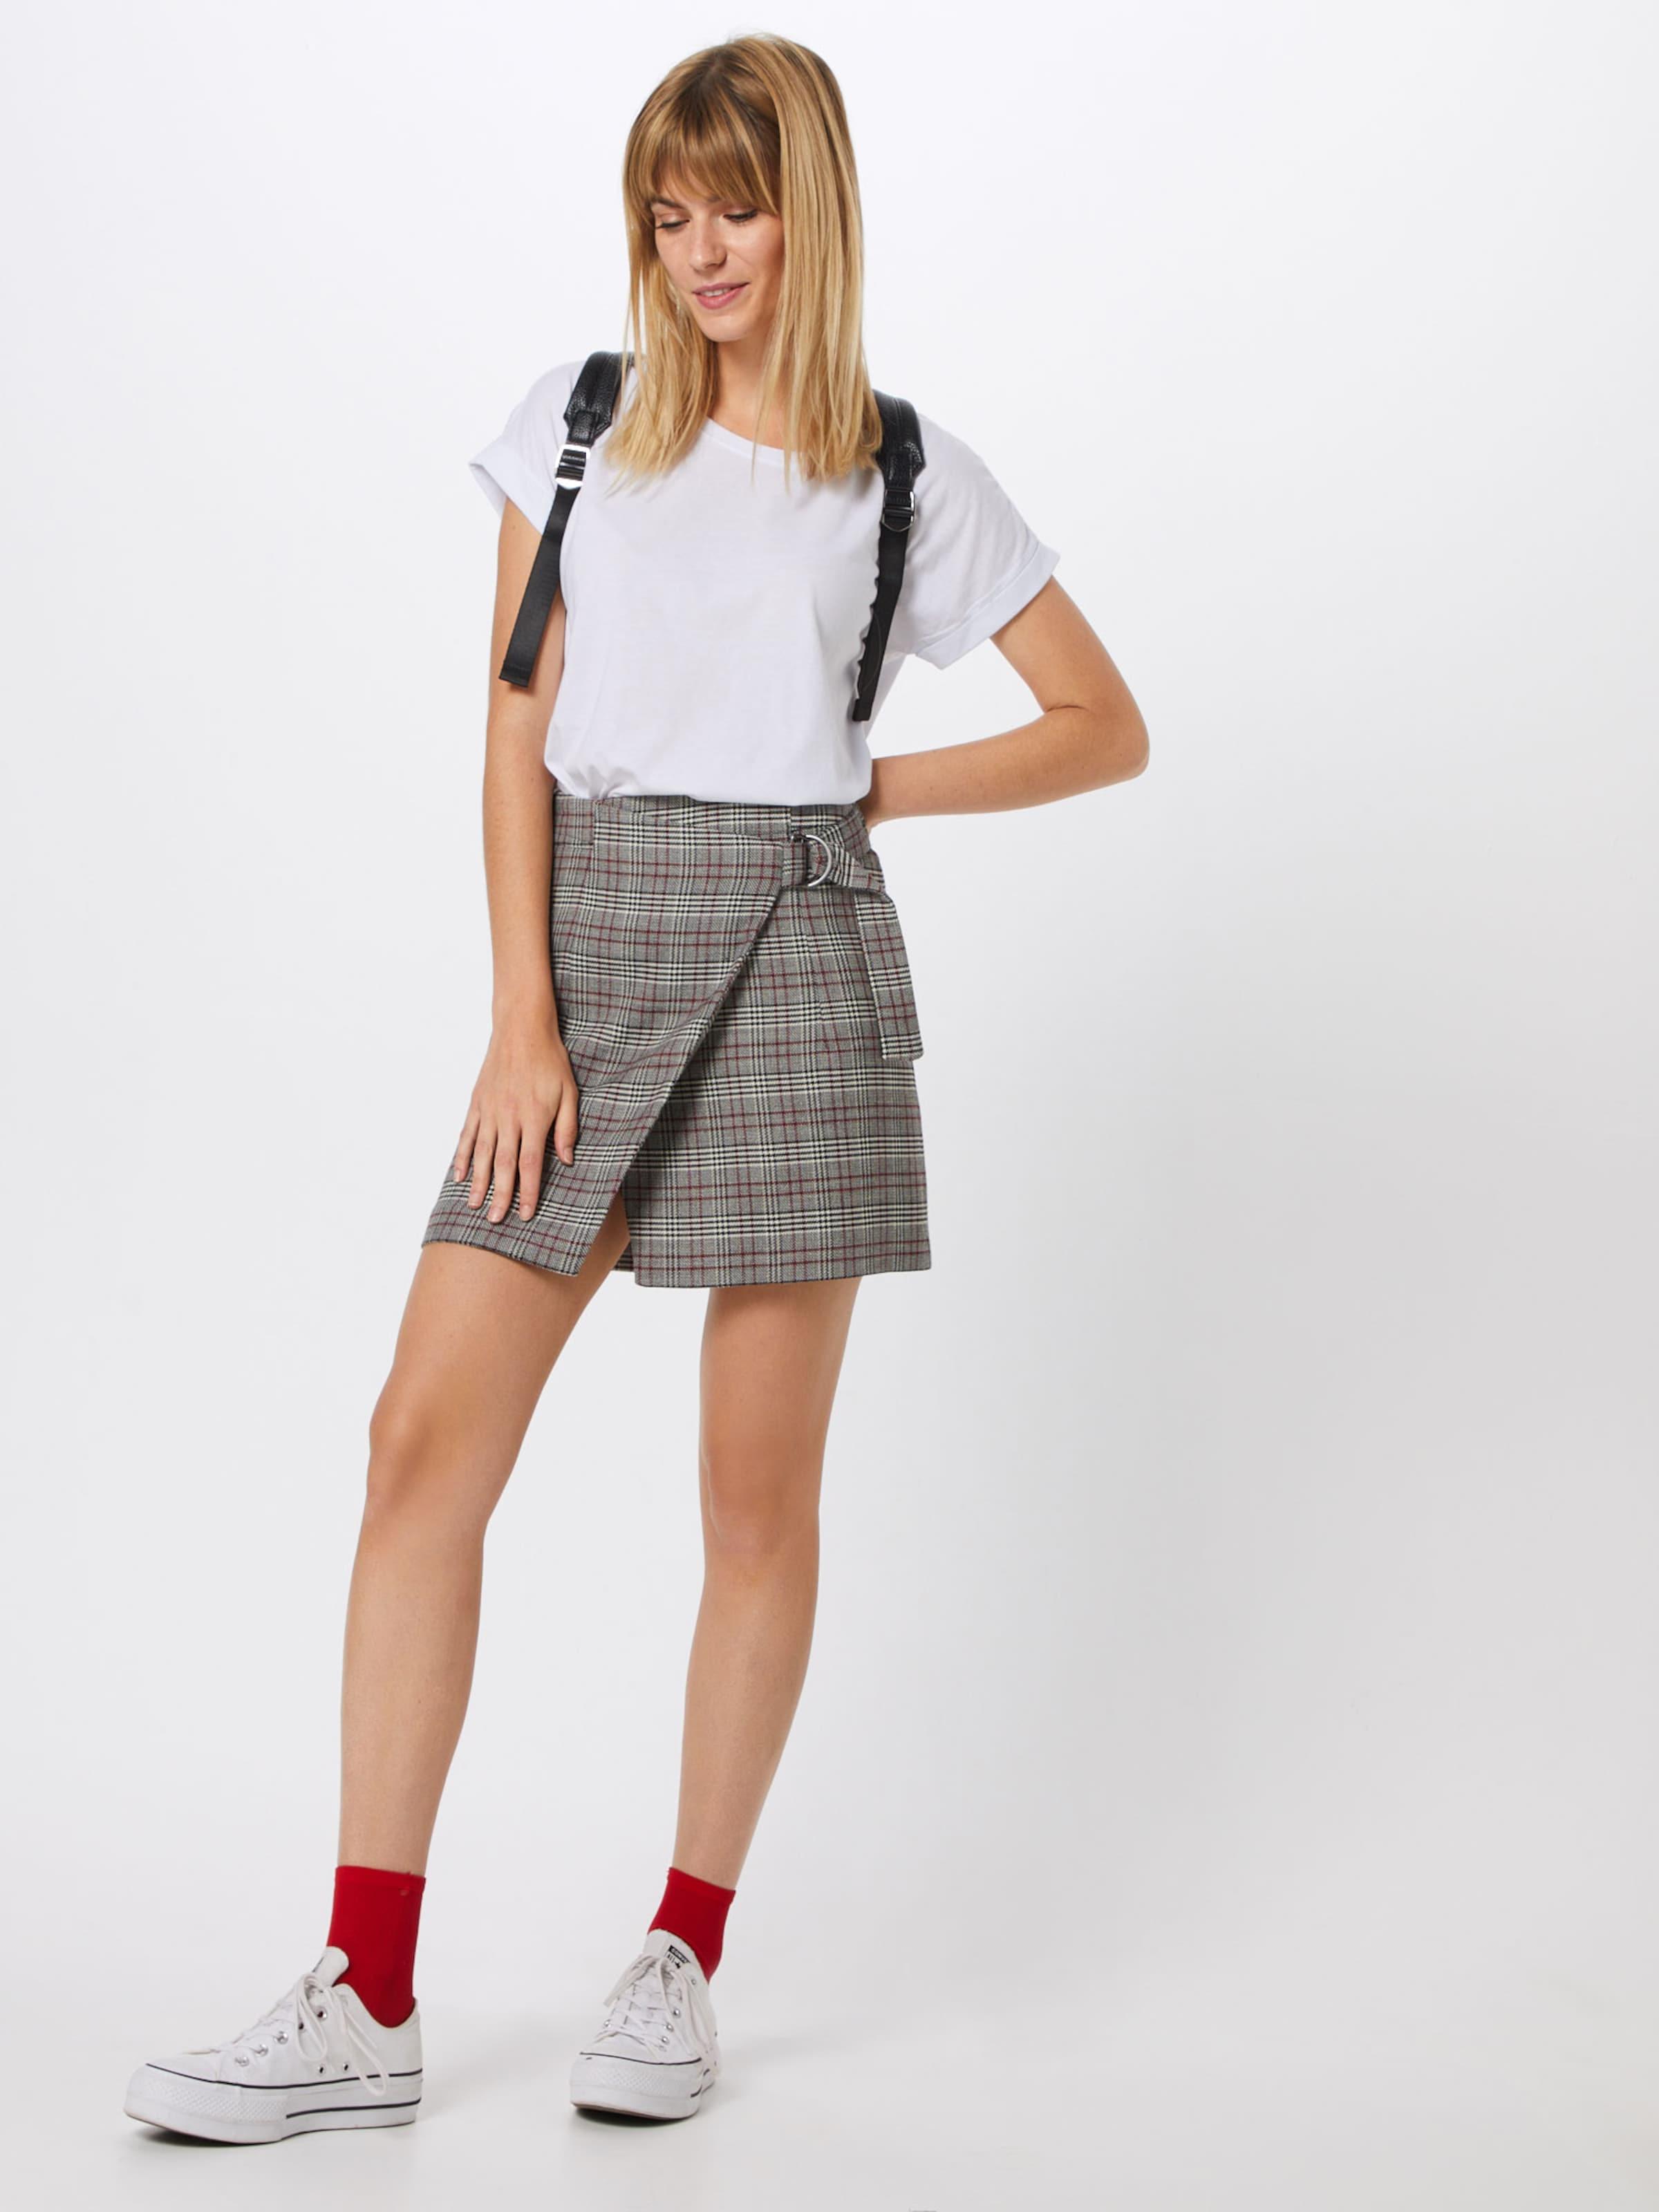 Woven' In Schwarz 'skirt Edc By Esprit GrauRot Rock Skirts 7yvmfgIYb6